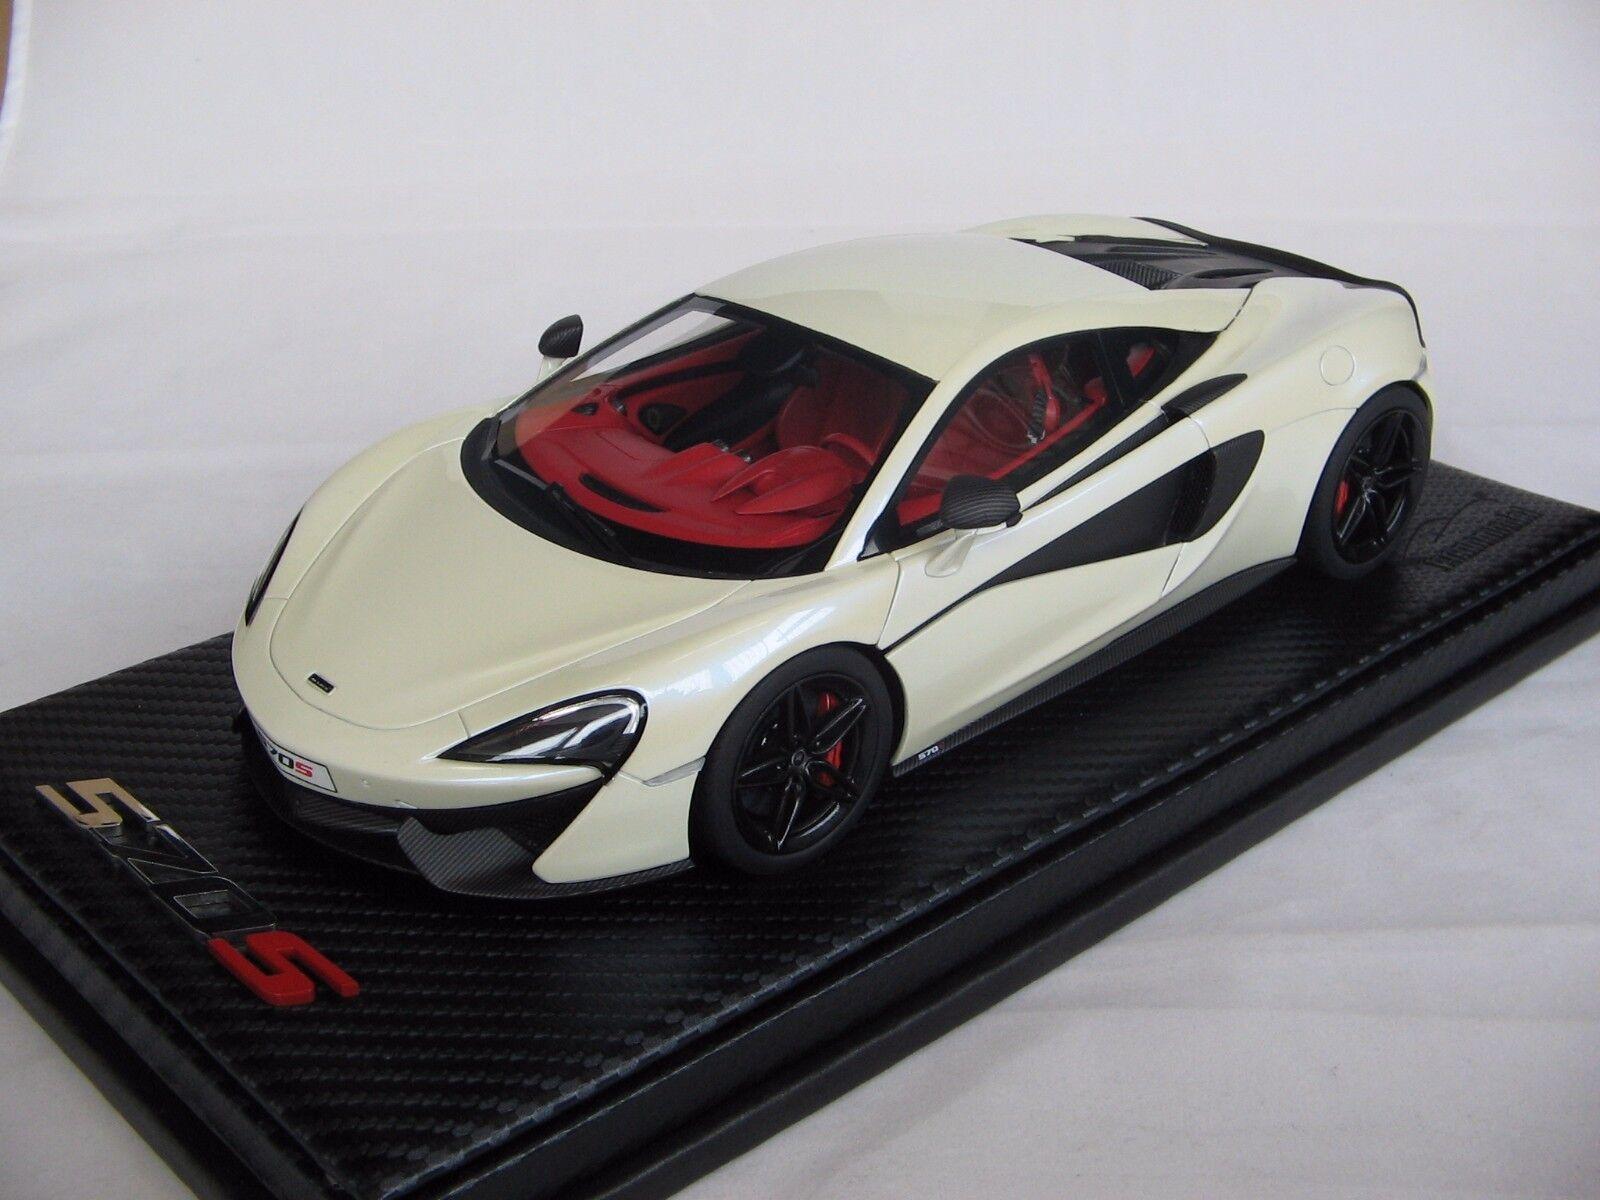 1/18 scale Tecnomodel McLaren 570S Coupè Pearl bianca 2015 - T18-EX02F